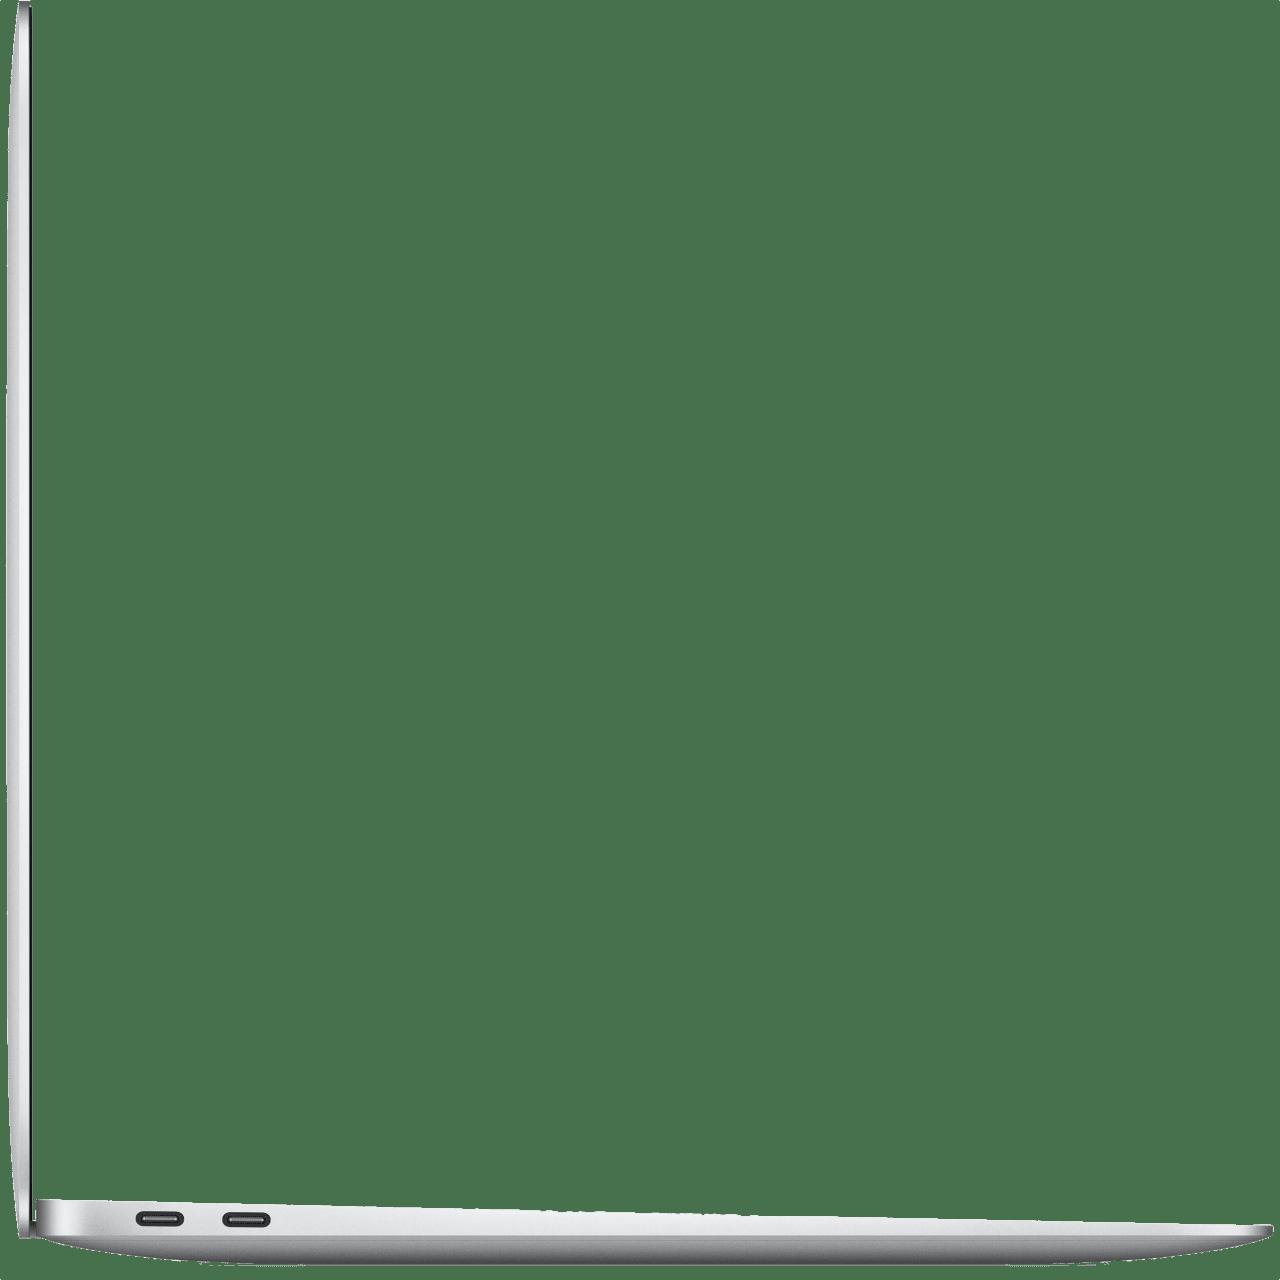 Silver Apple MacBook Air (Late 2020) - Inglés (QWERTY) Portátil - Apple M1 - 16GB - 512GB SSD - Apple Integrated 8-core GPU.3